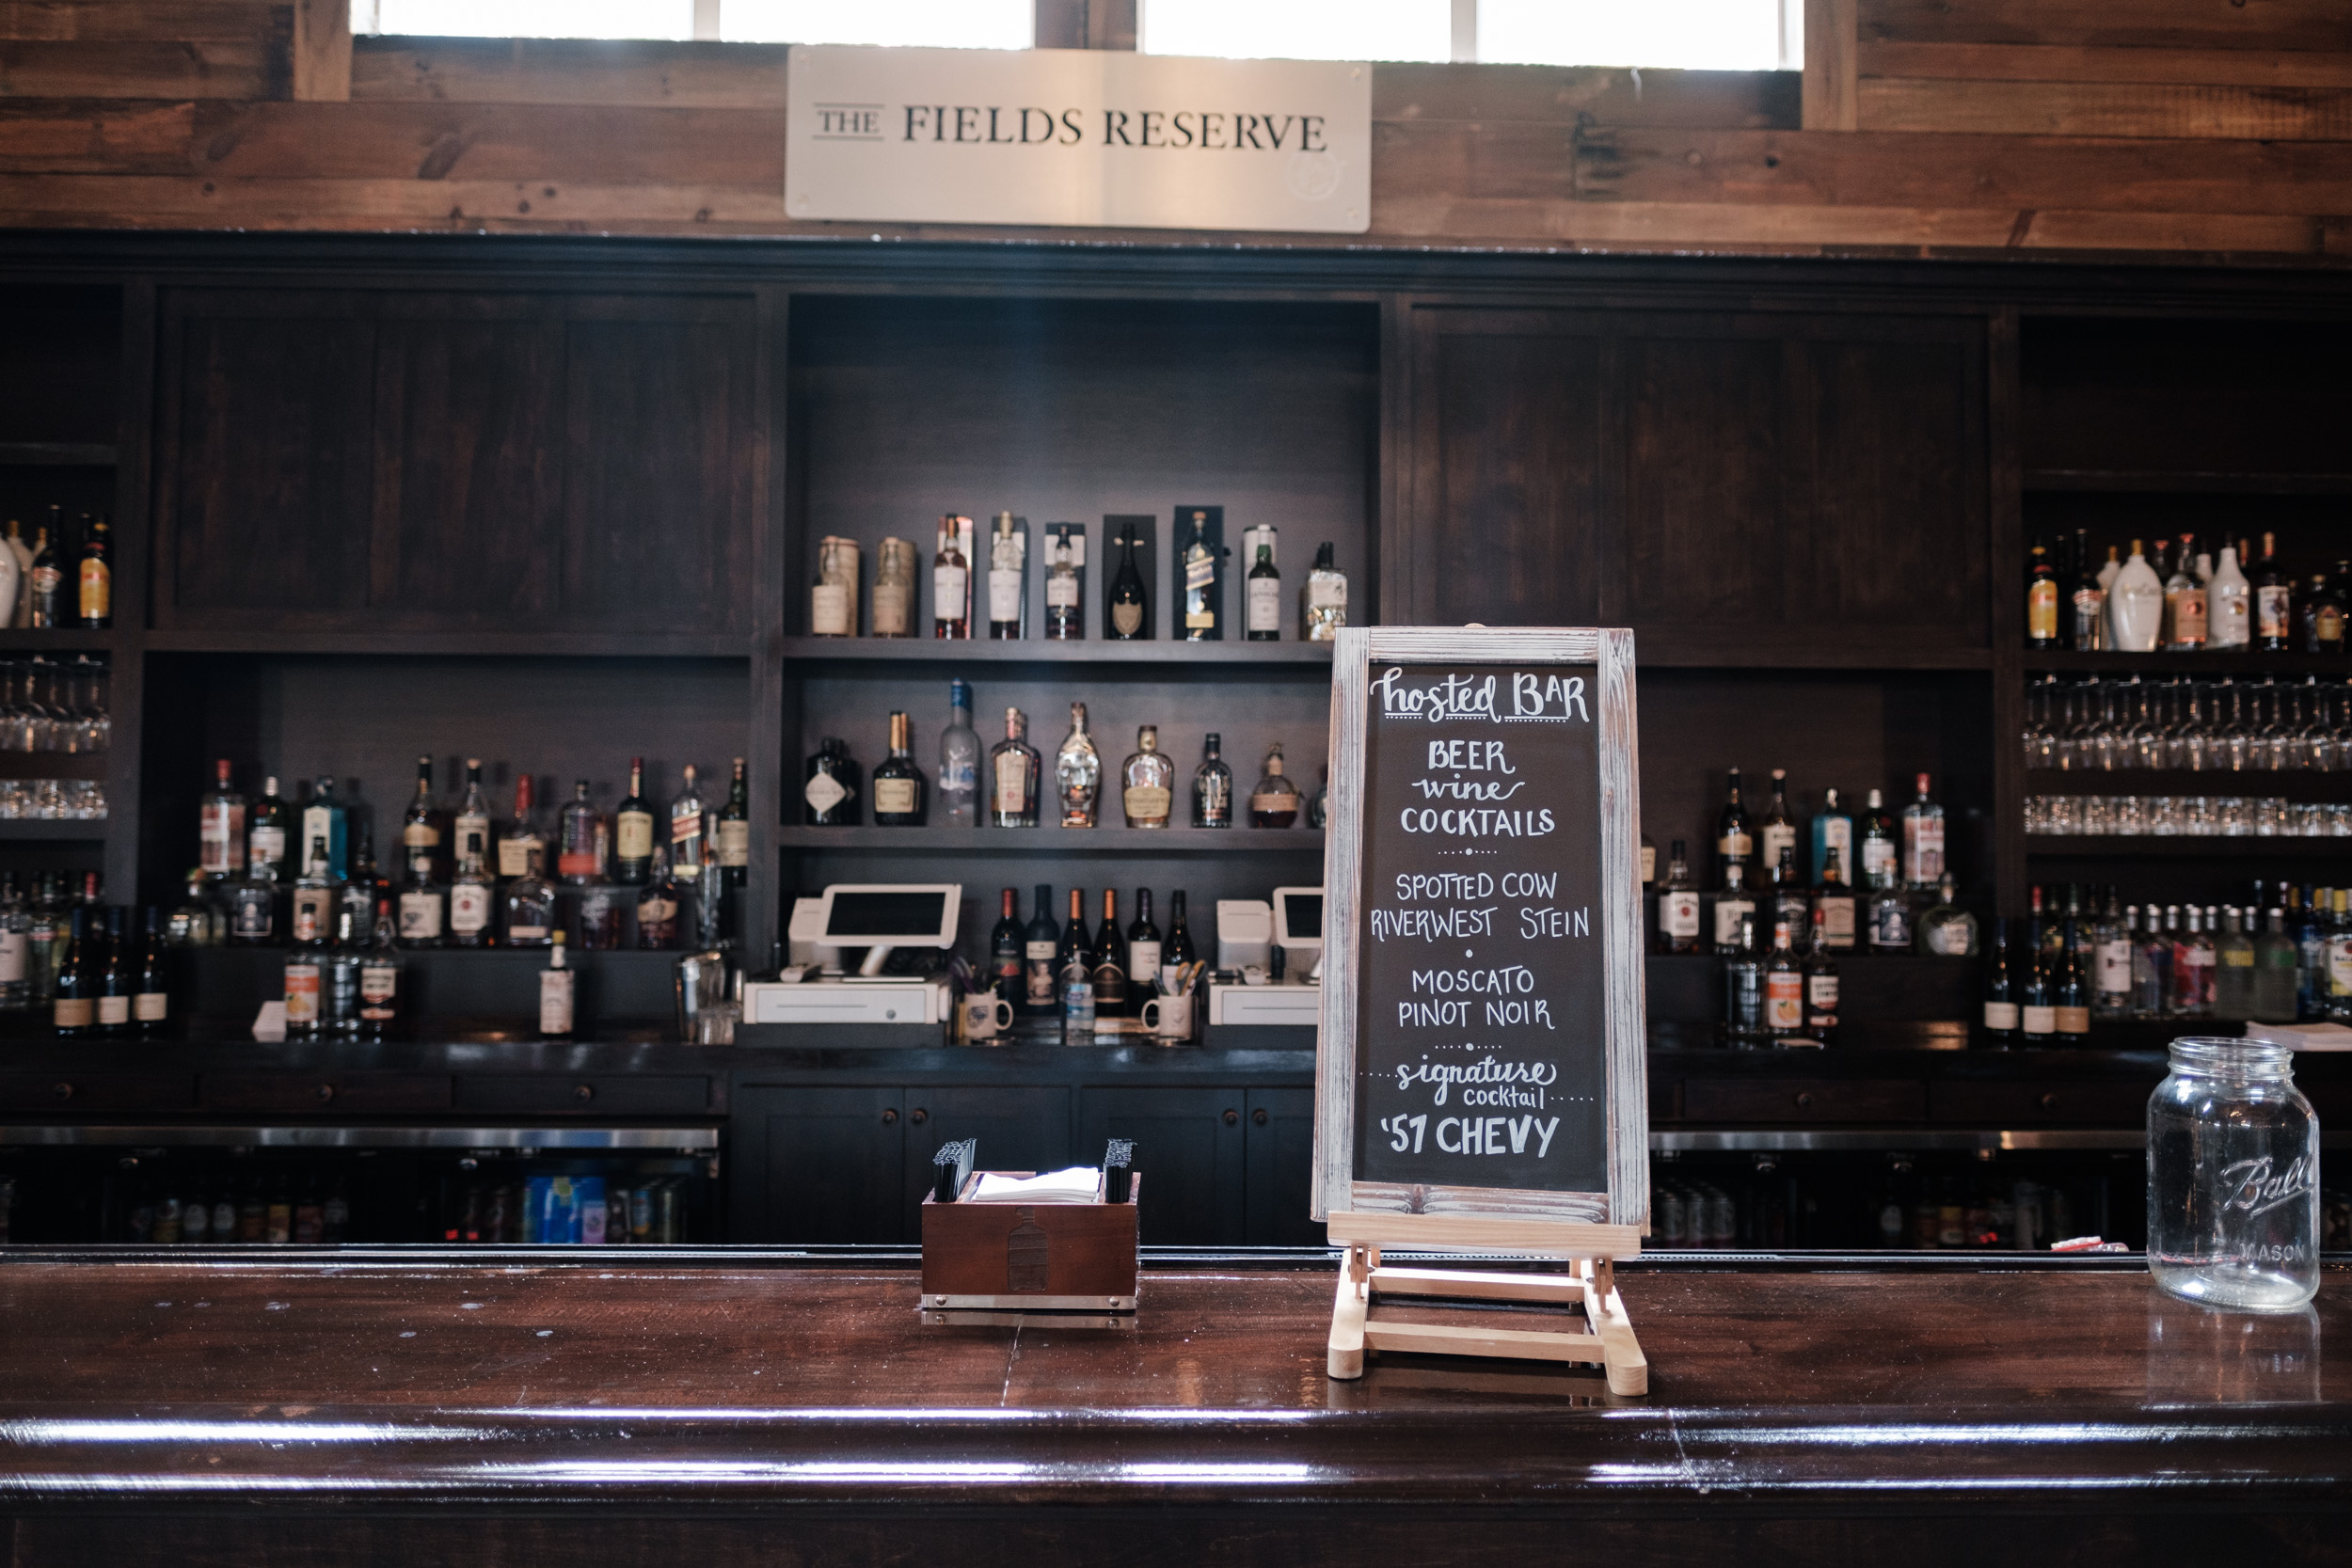 19-06-22-Ryan-Katie-The-Fields-Reserve-Wedding-2.jpg